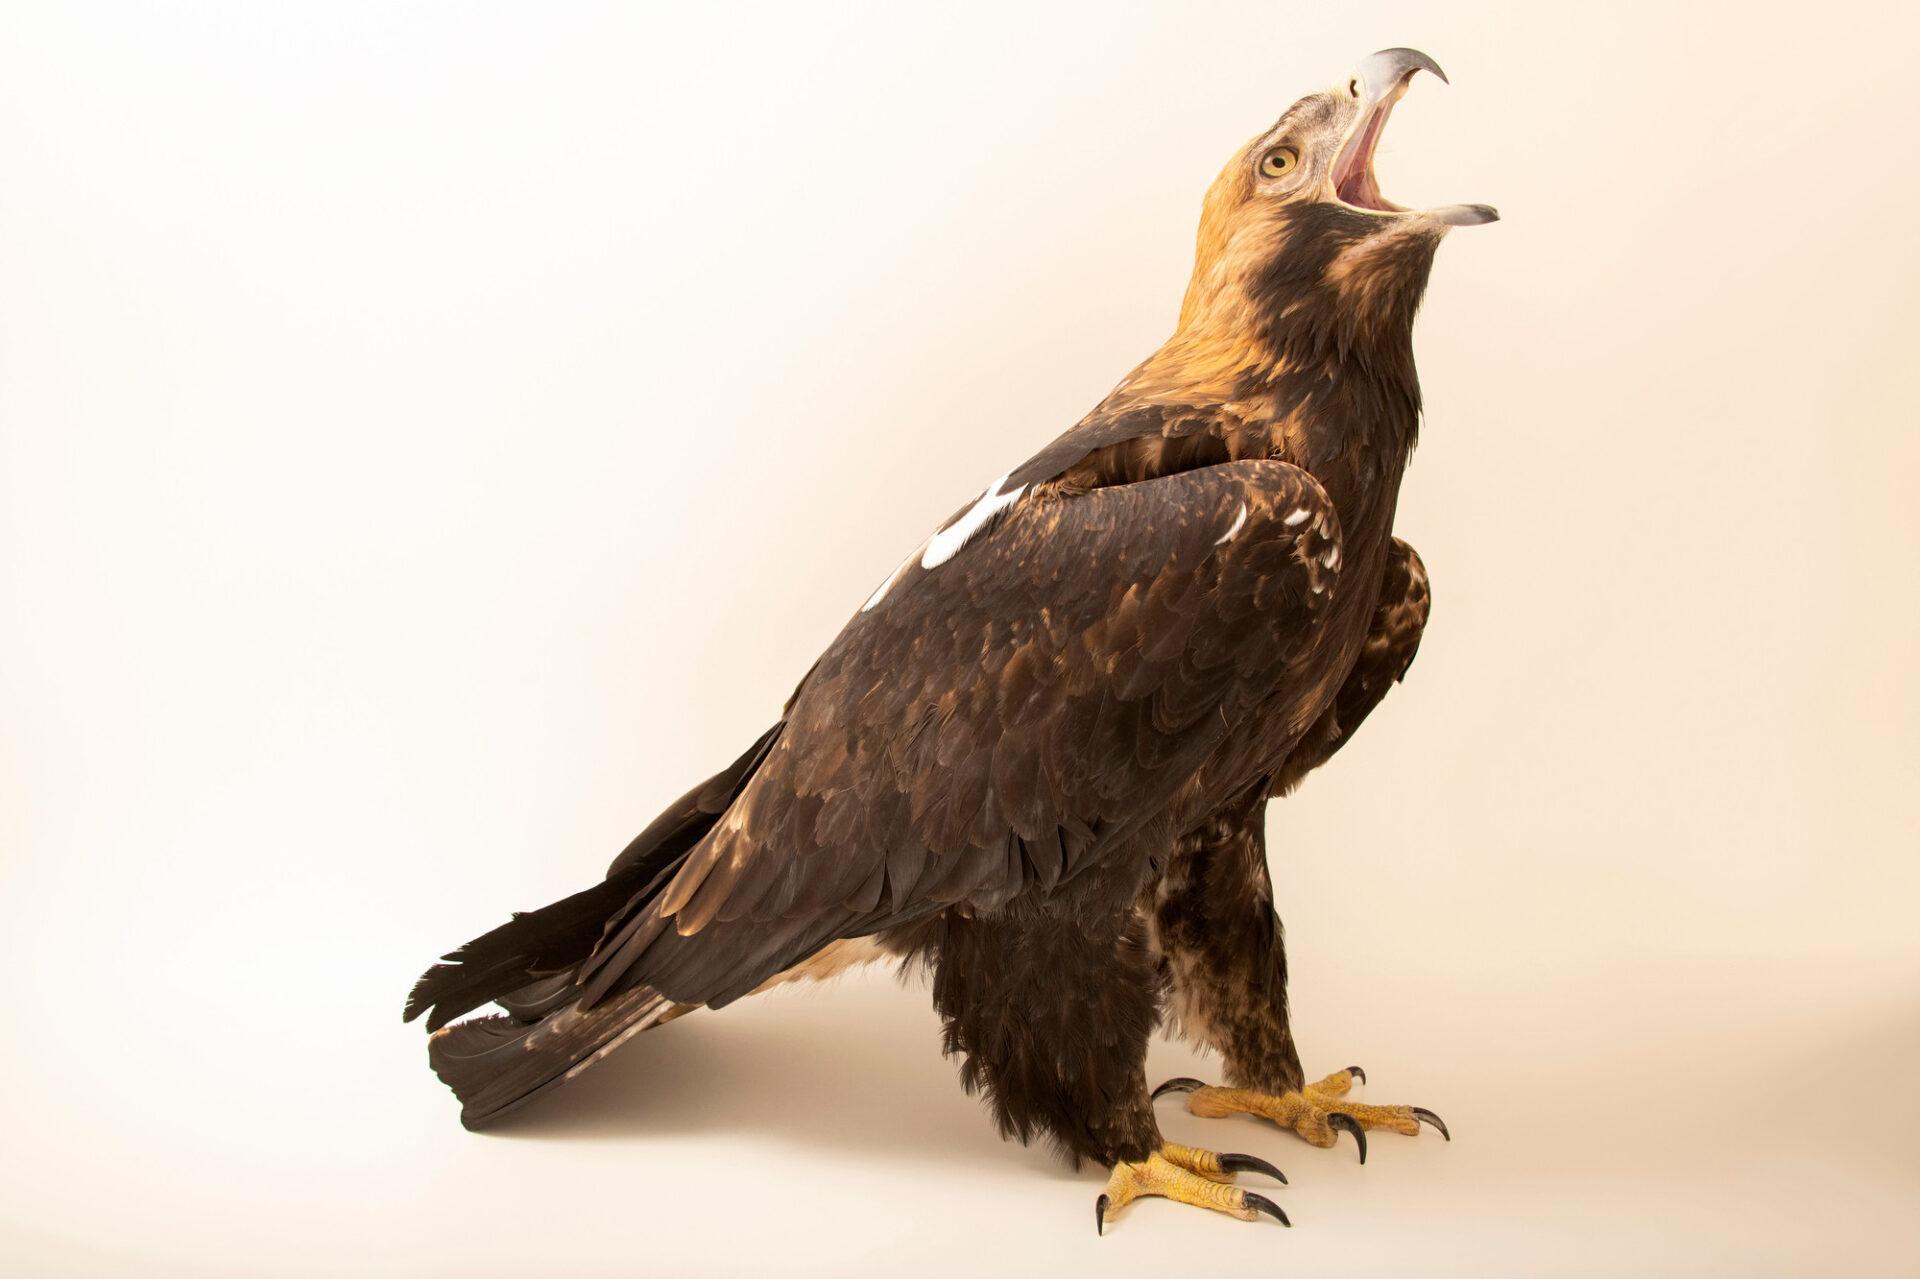 Photo: An Eastern imperial eagle (Aquila heliaca) at Tierpark Berlin.